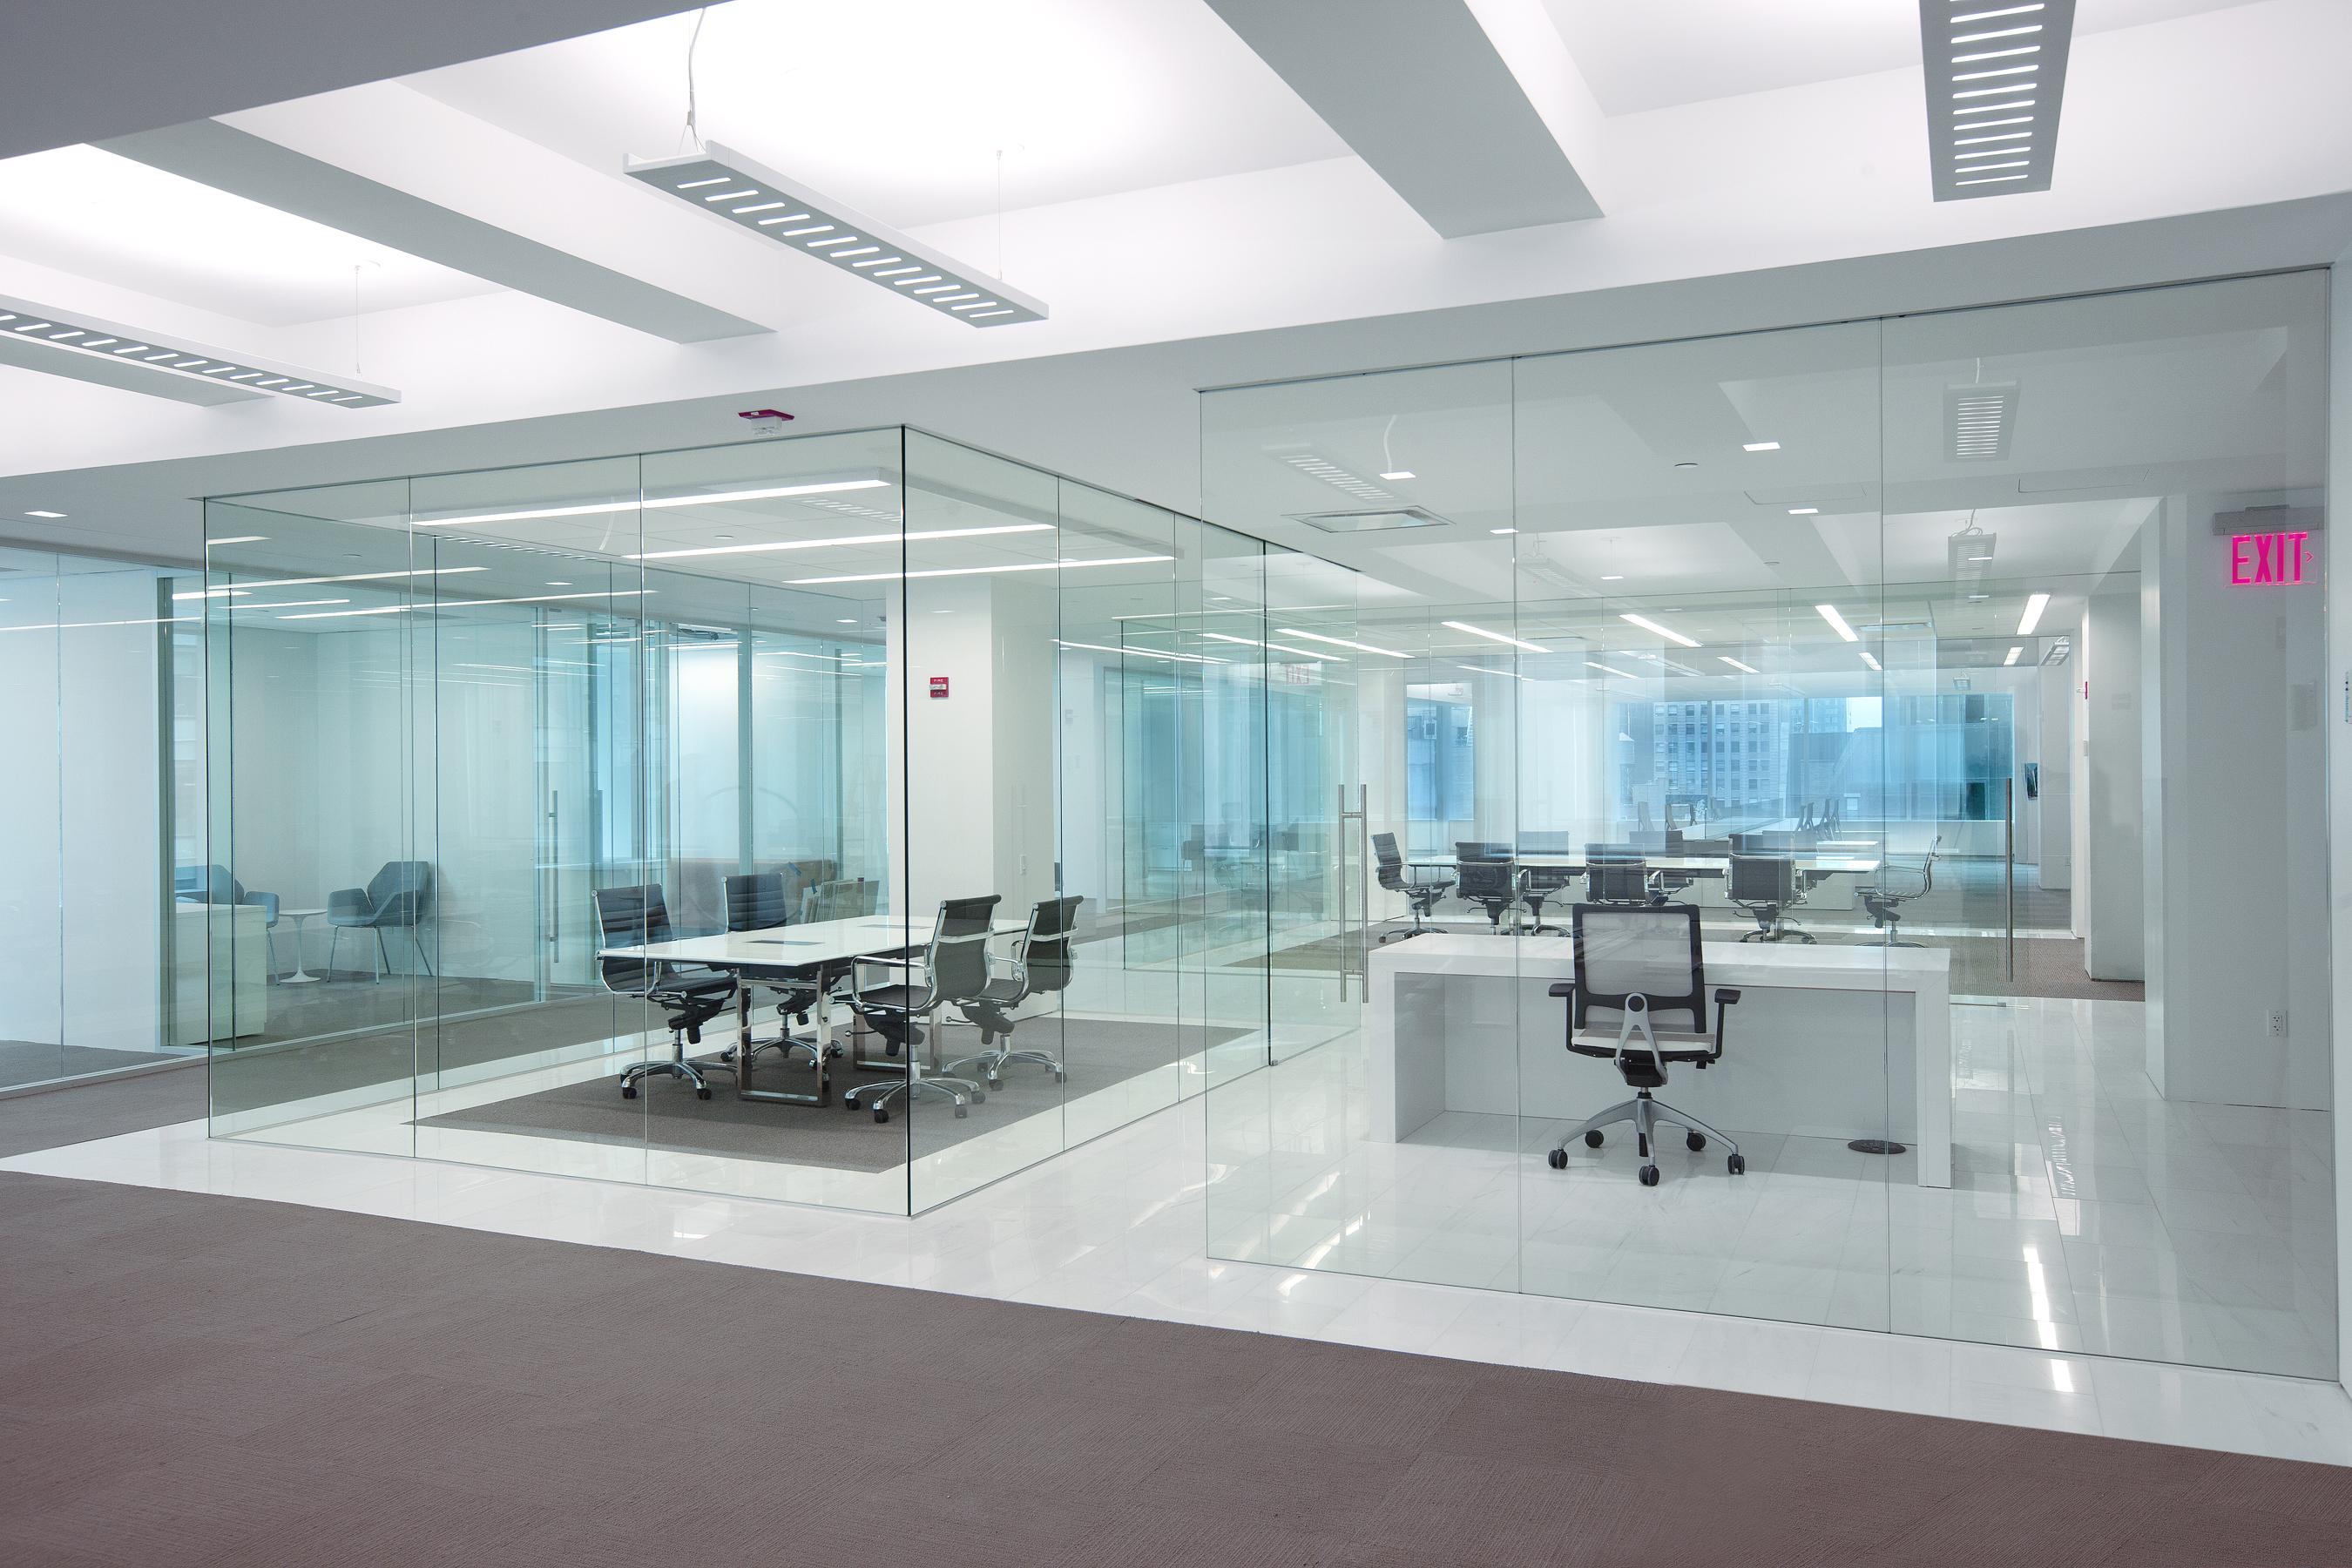 office interior glass walls photo - 3